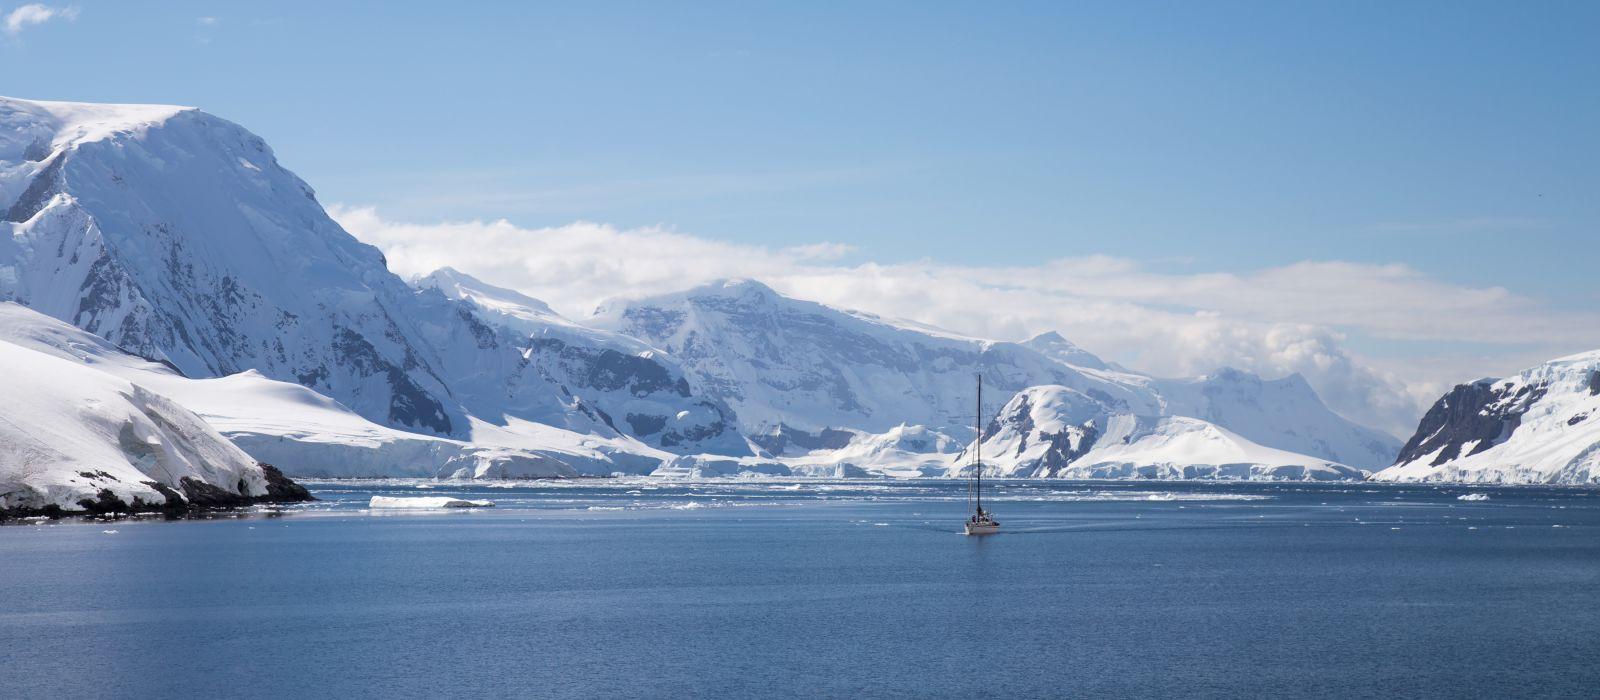 Antarctica travel guide - Ship sails through the neumayer channel, Antarctic